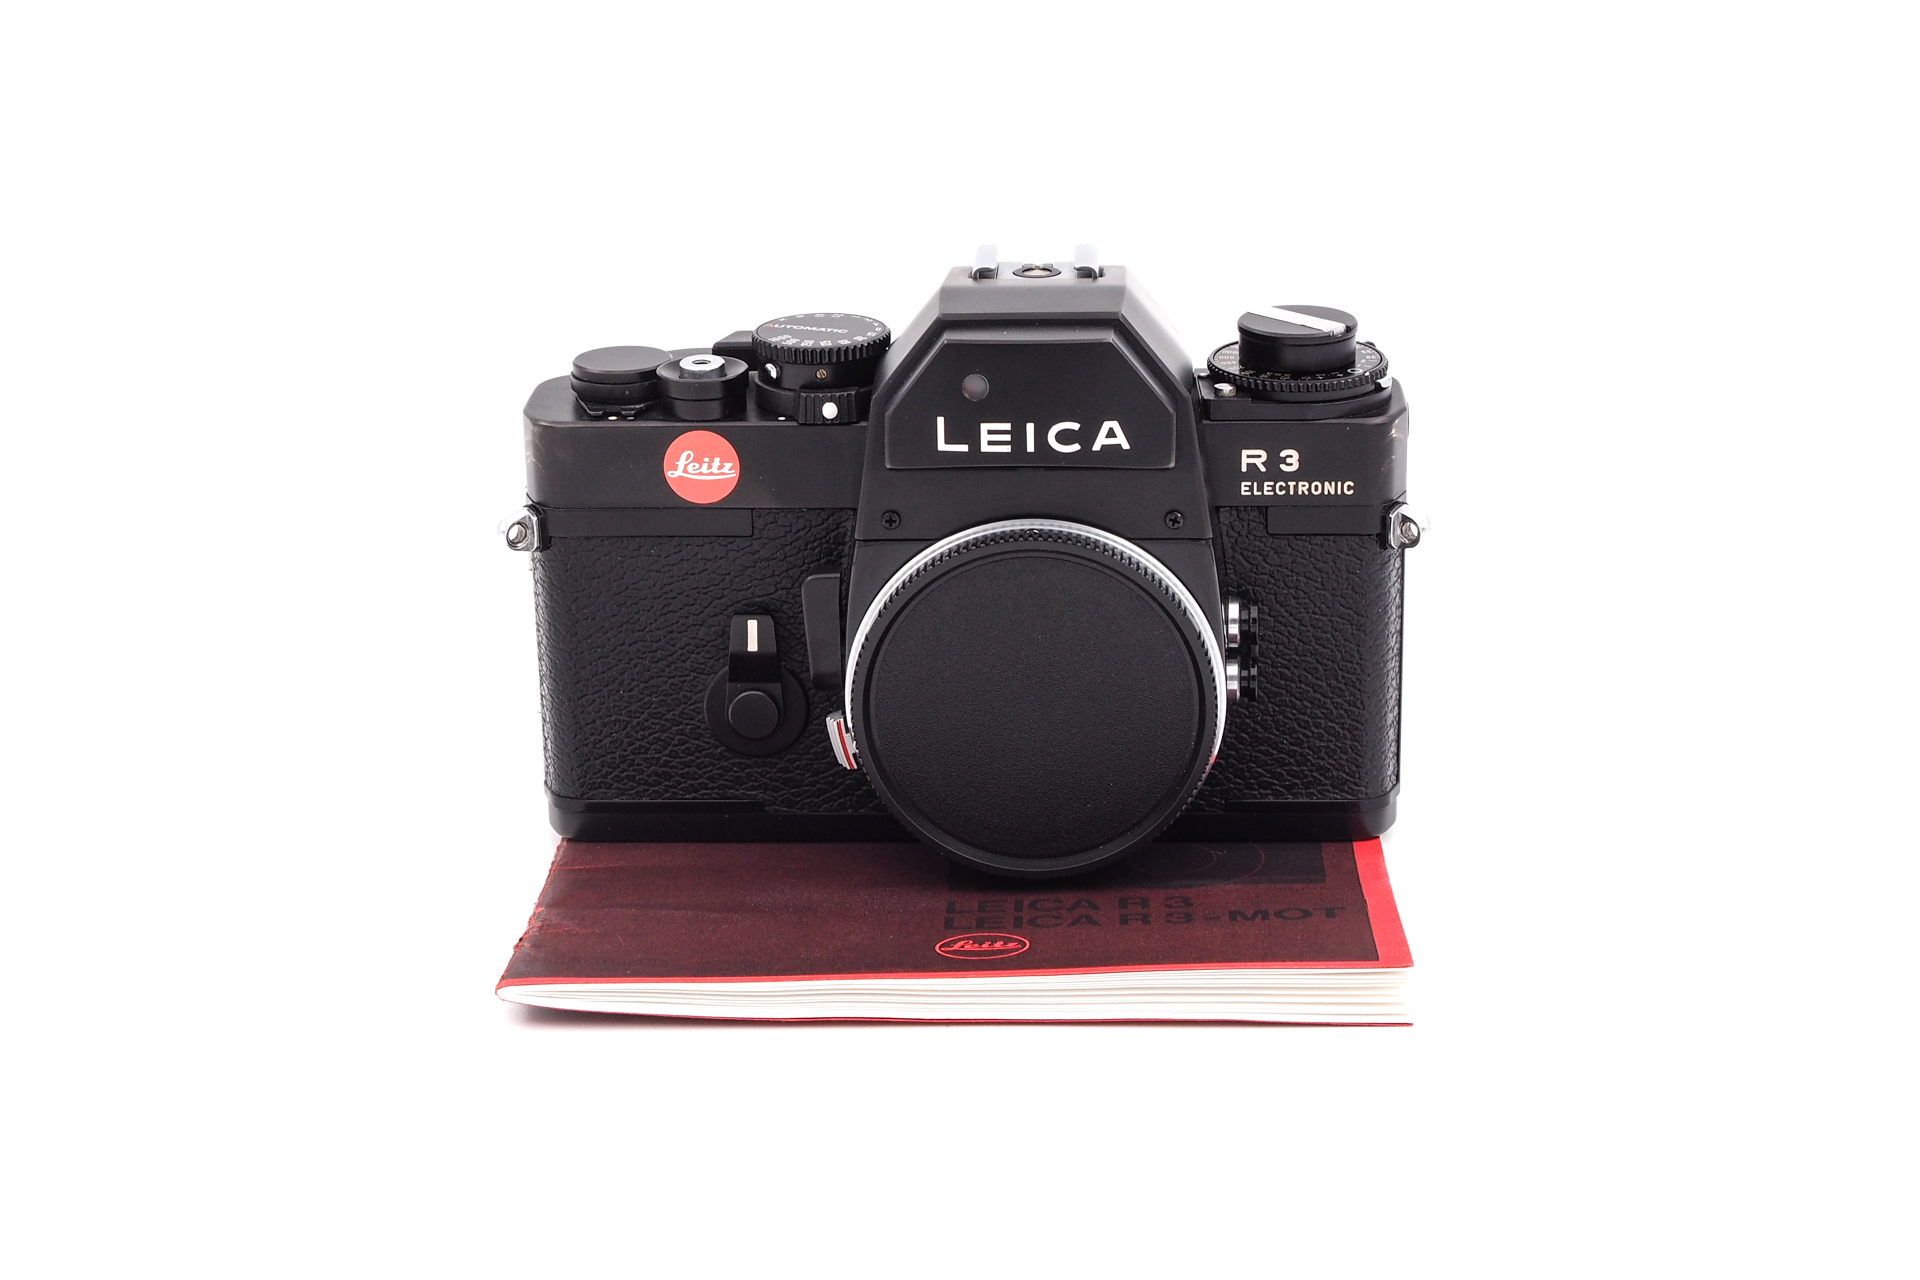 Leica R3 electronic